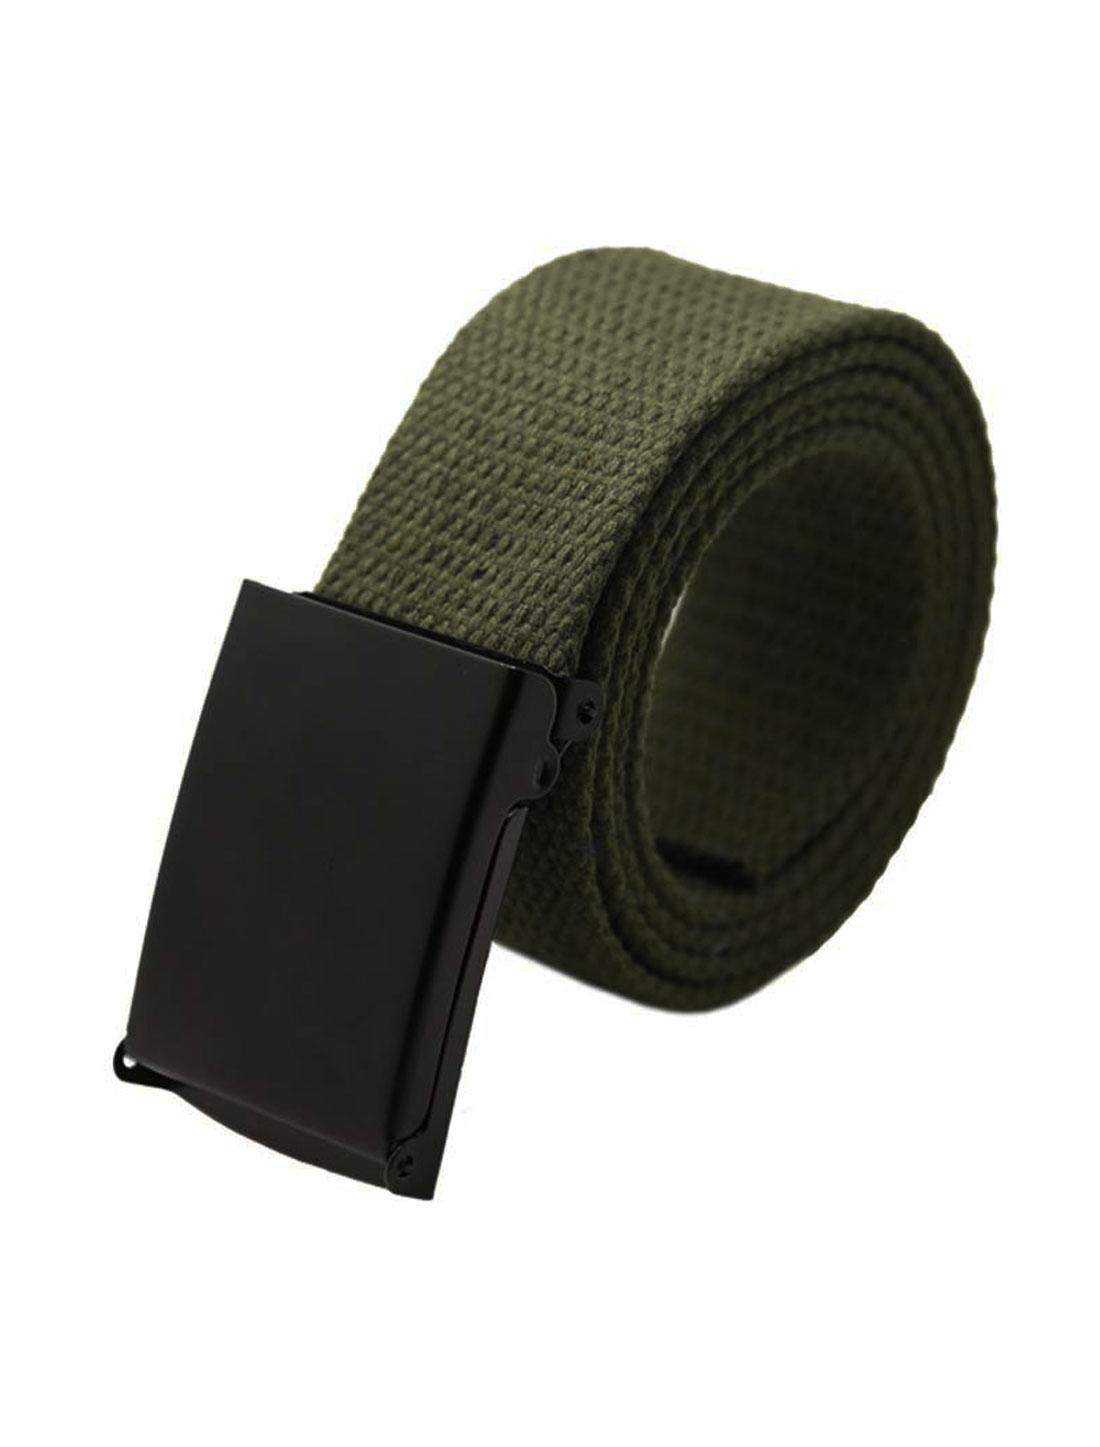 "Unisex Canvas No Hole Slide Buckle Waist Belt Width 1 5/8"" Army Green"